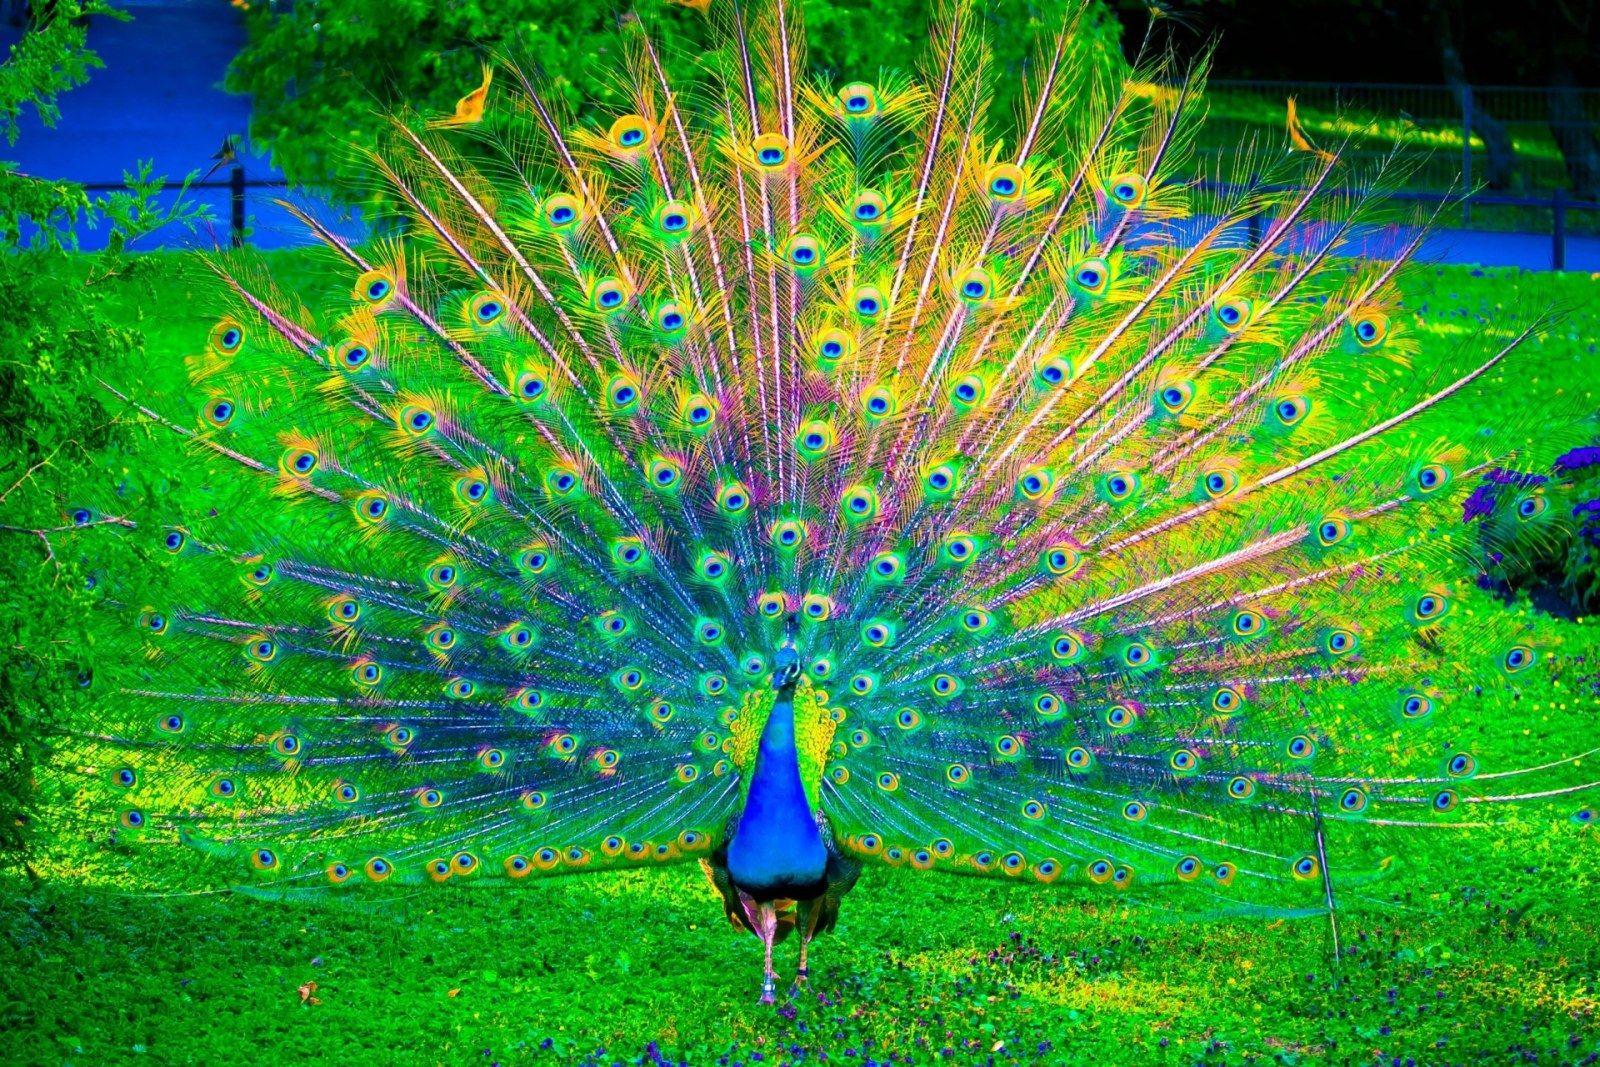 Beautiful Peacocks Beautiful peacock dancing Peacock